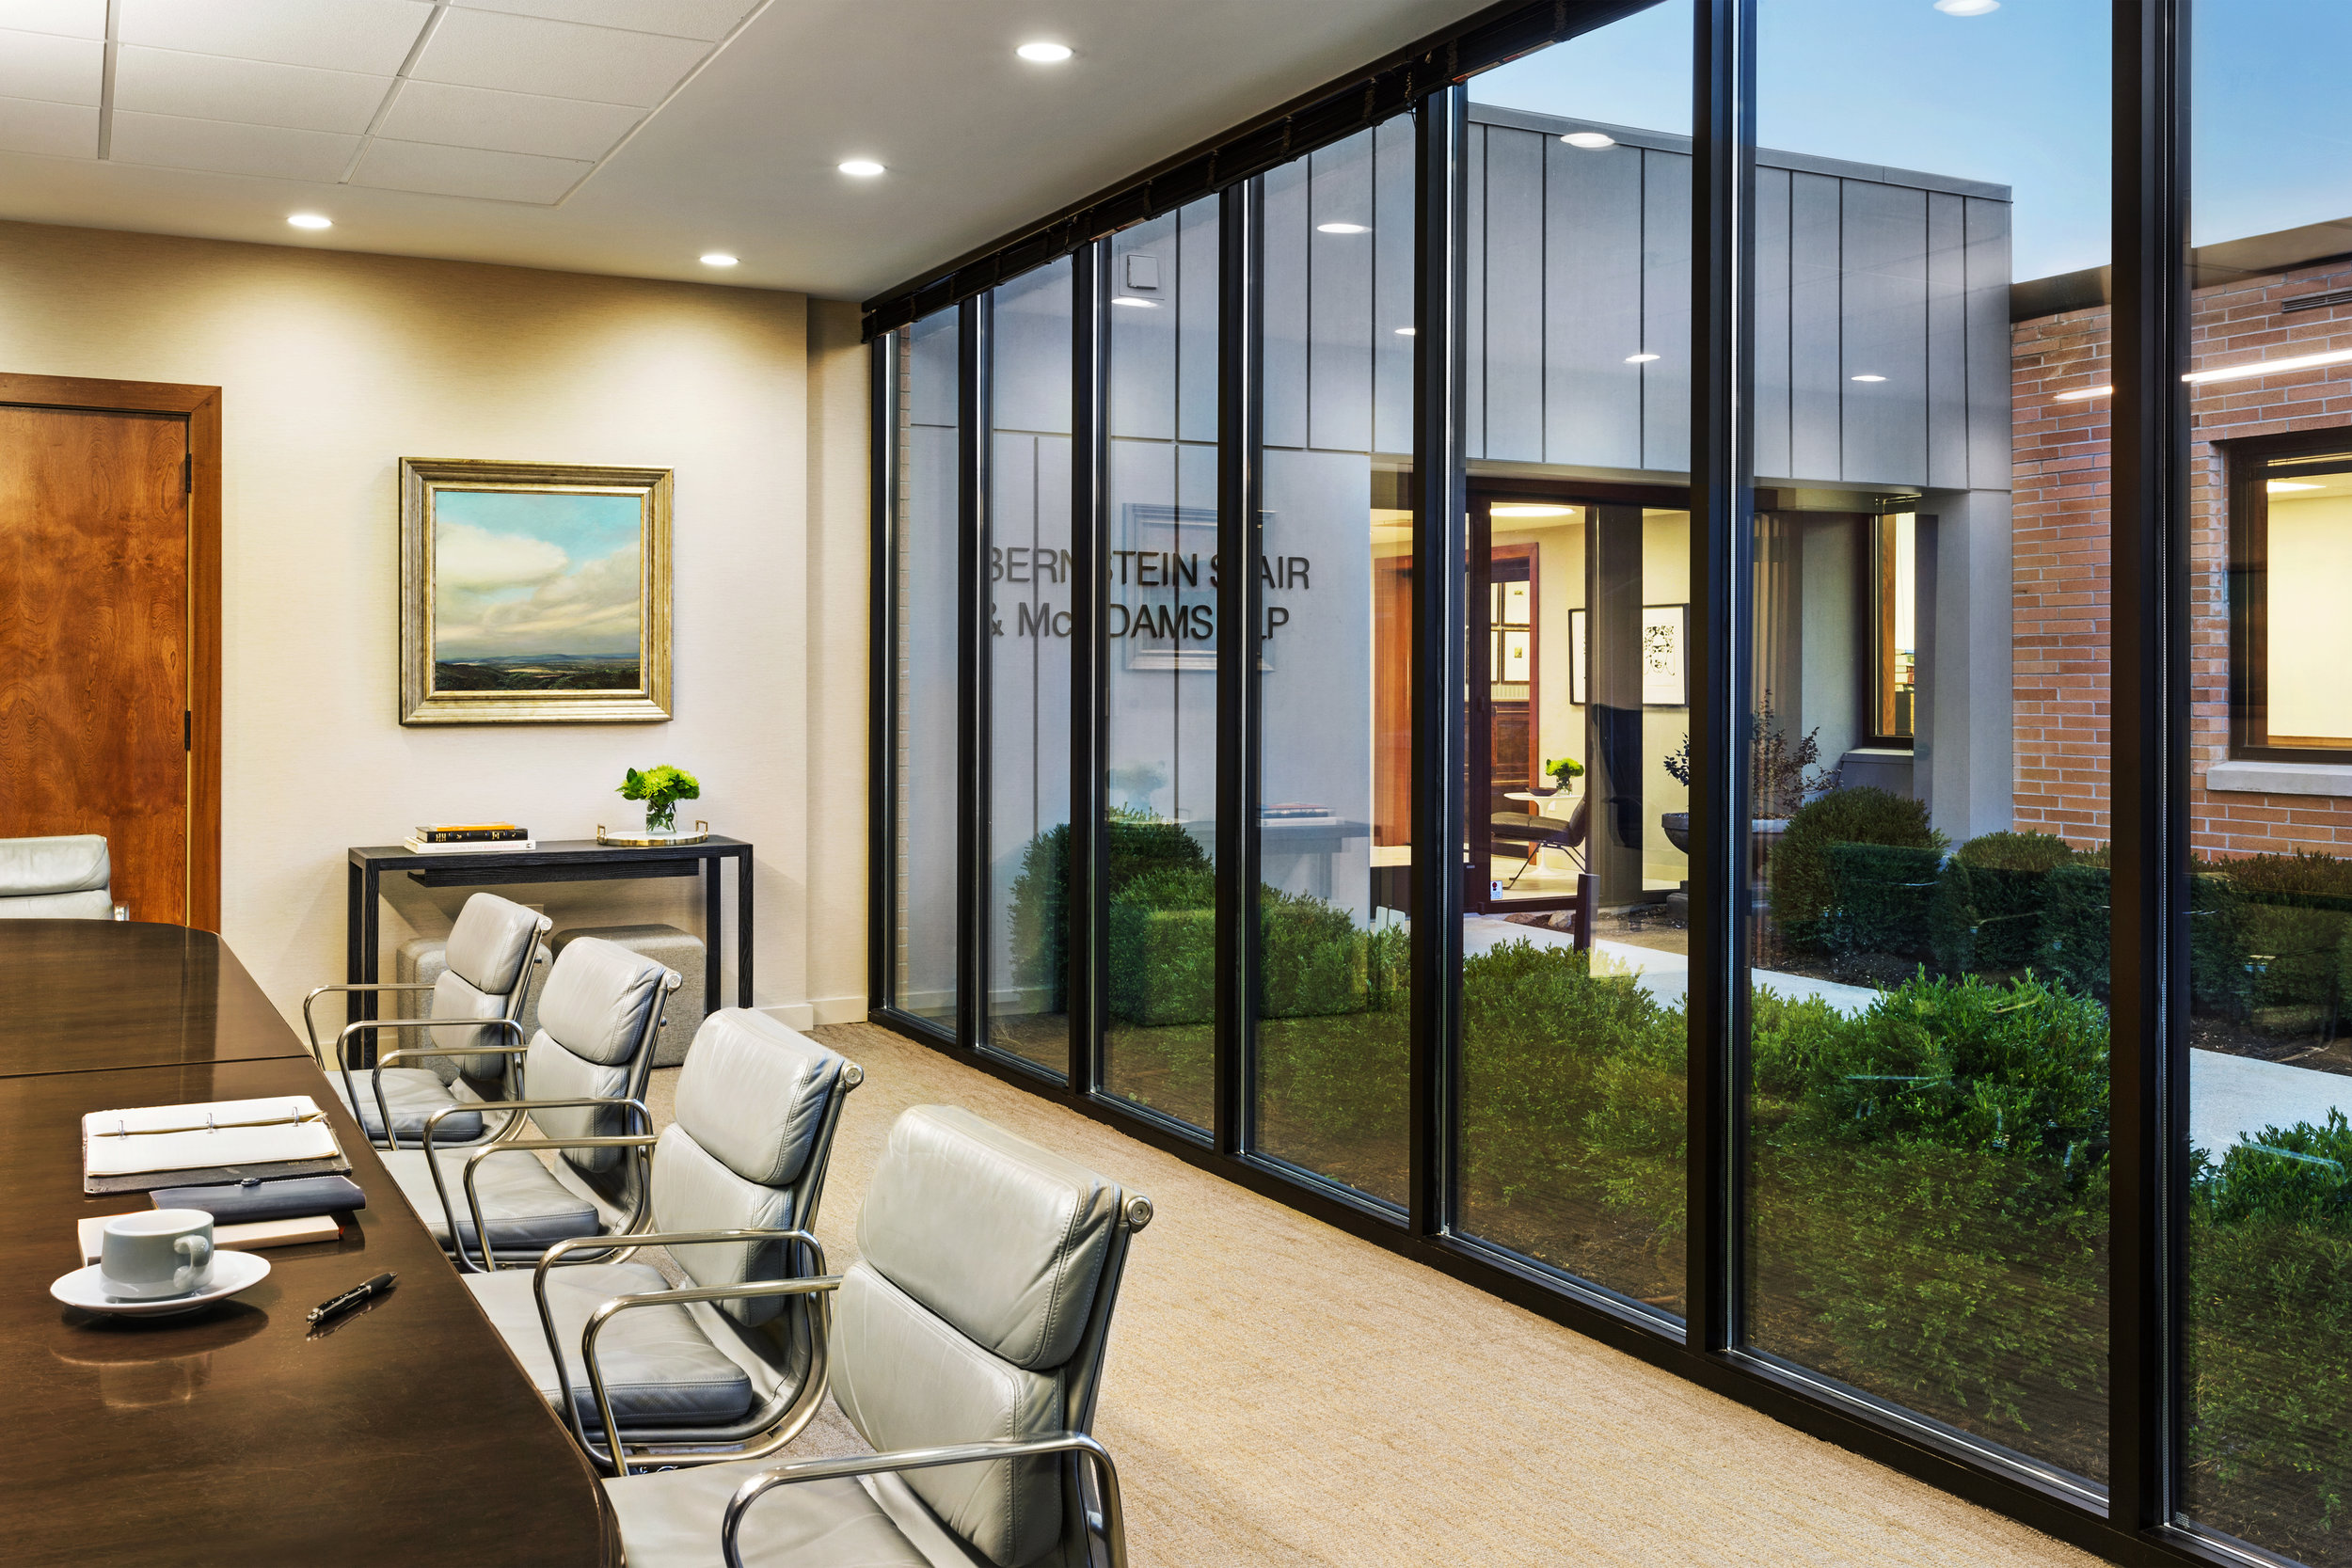 Lauderdale_Design_Group_Interior_Design_Knoxville_BSM